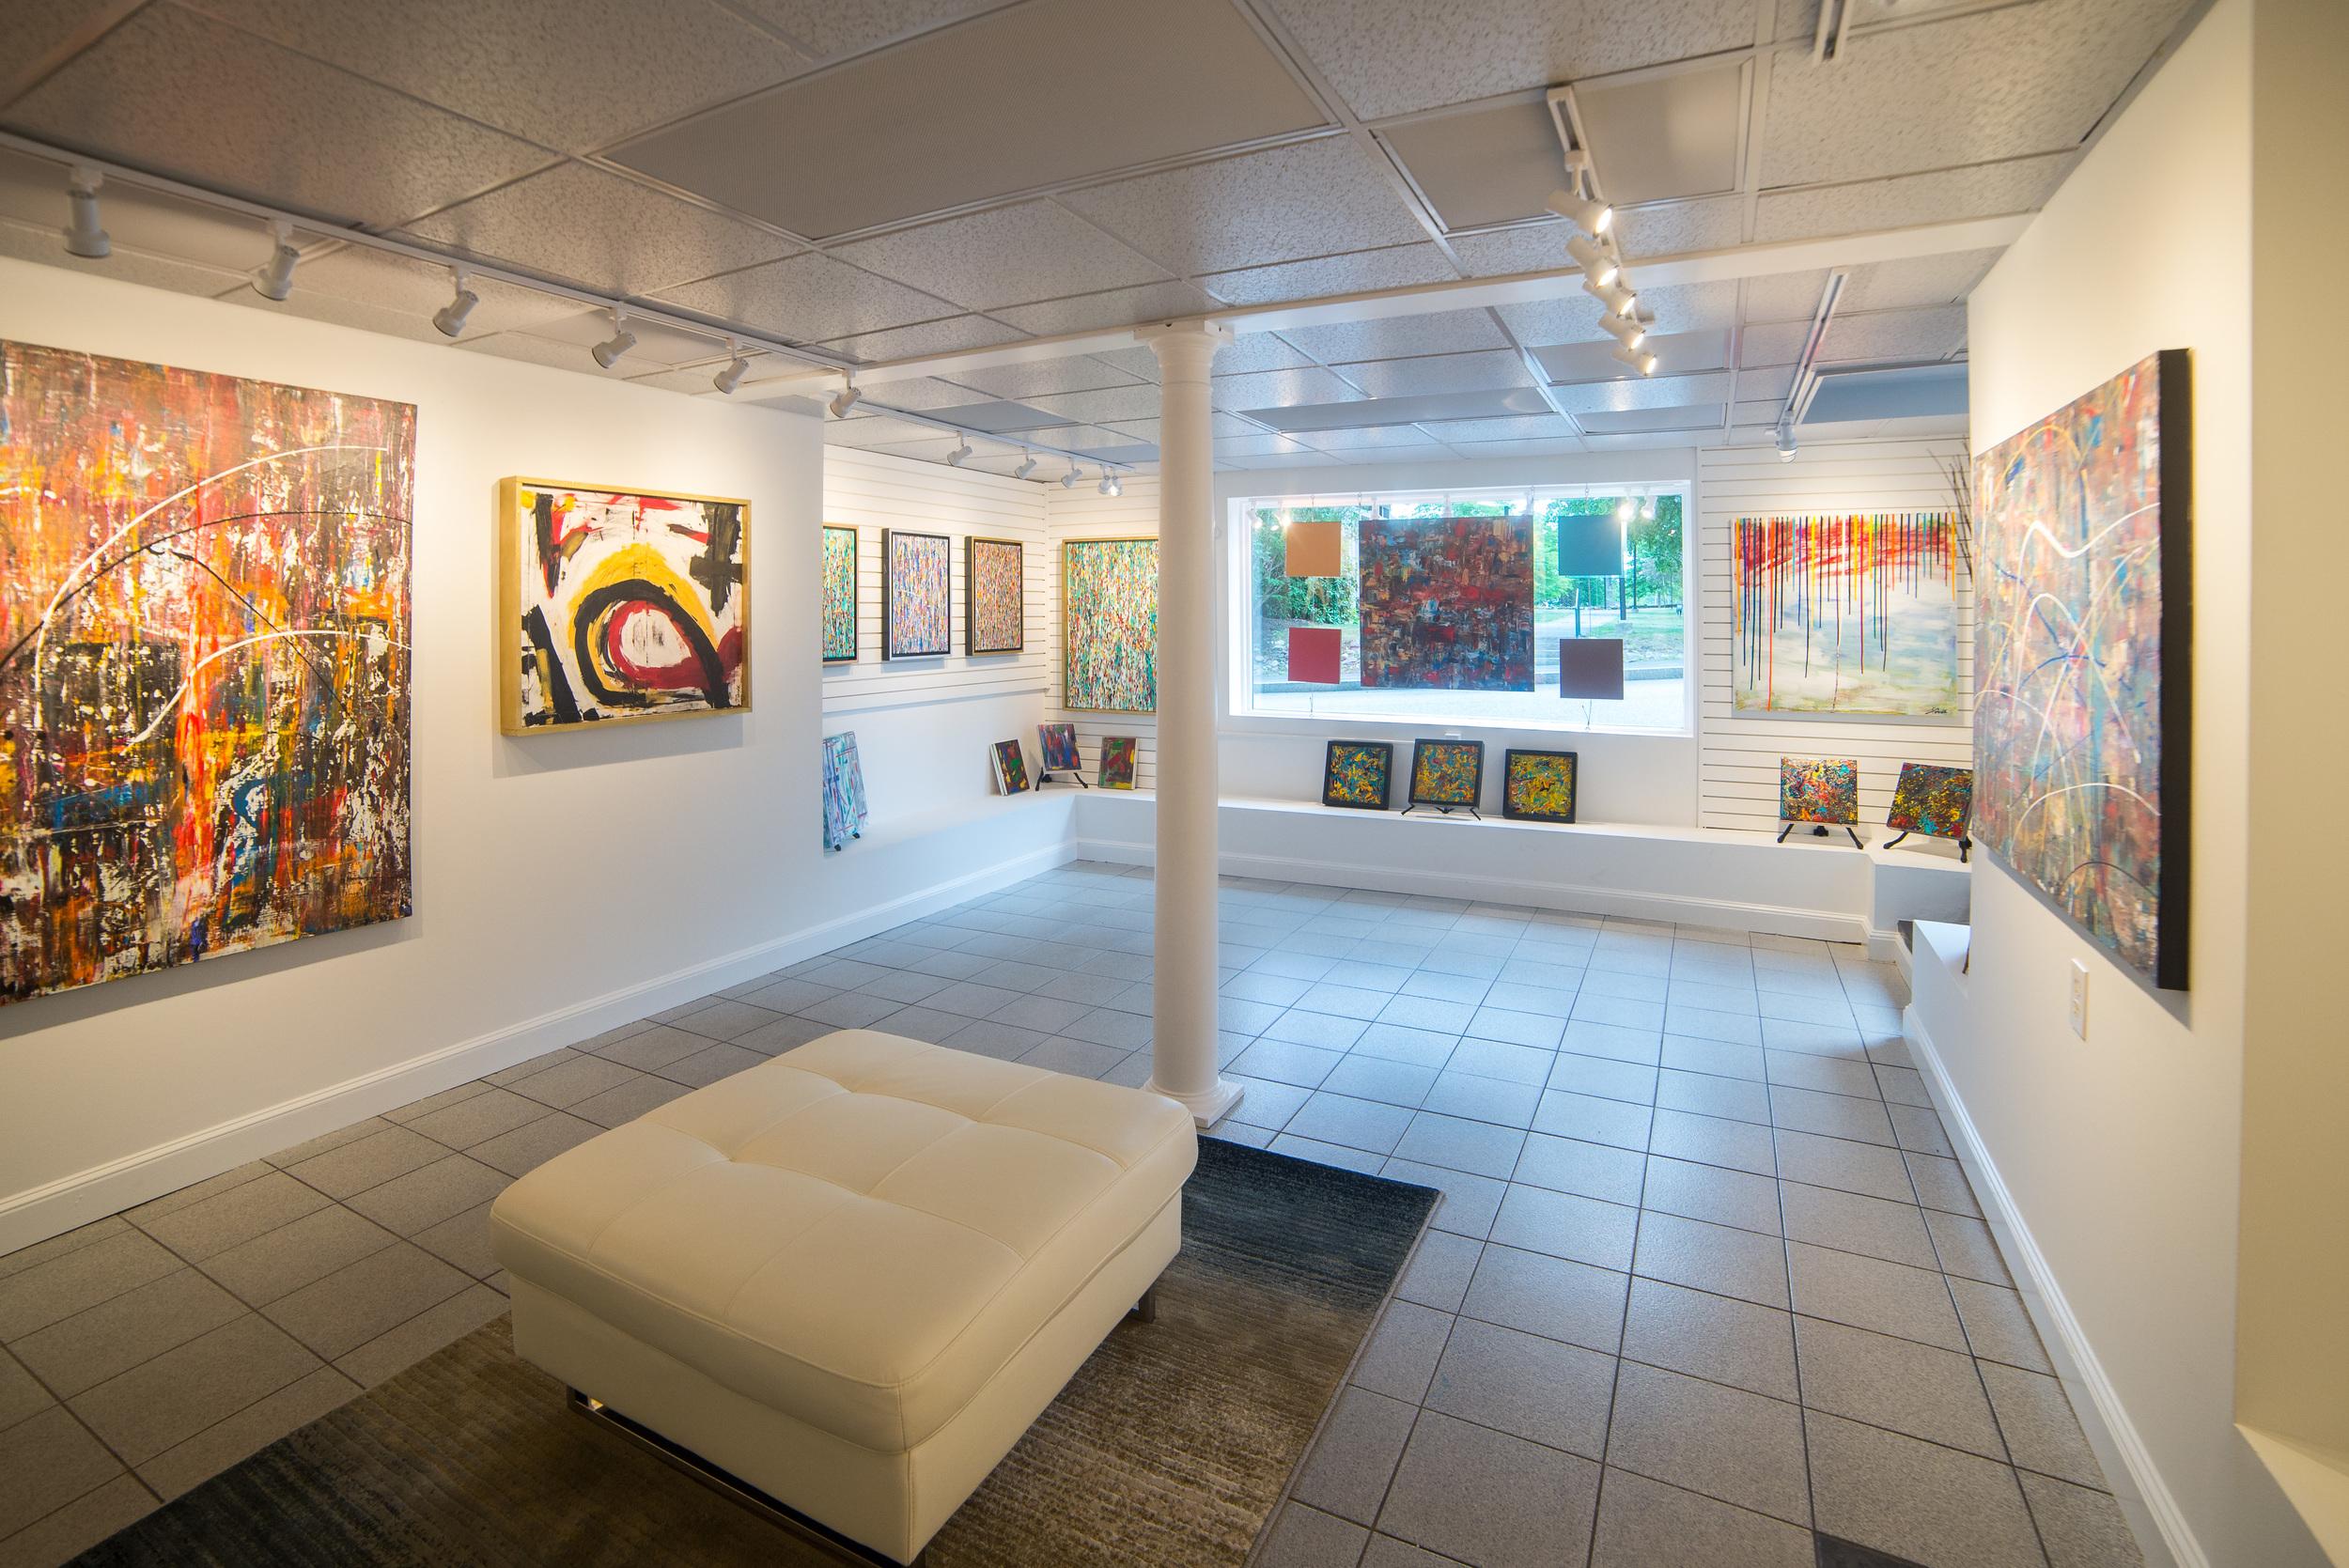 June_2016_Portland_Maine_20160627-DSC_6733 By Corey Templeton Bowe Art Gallery Freeport ME - Large.jpg